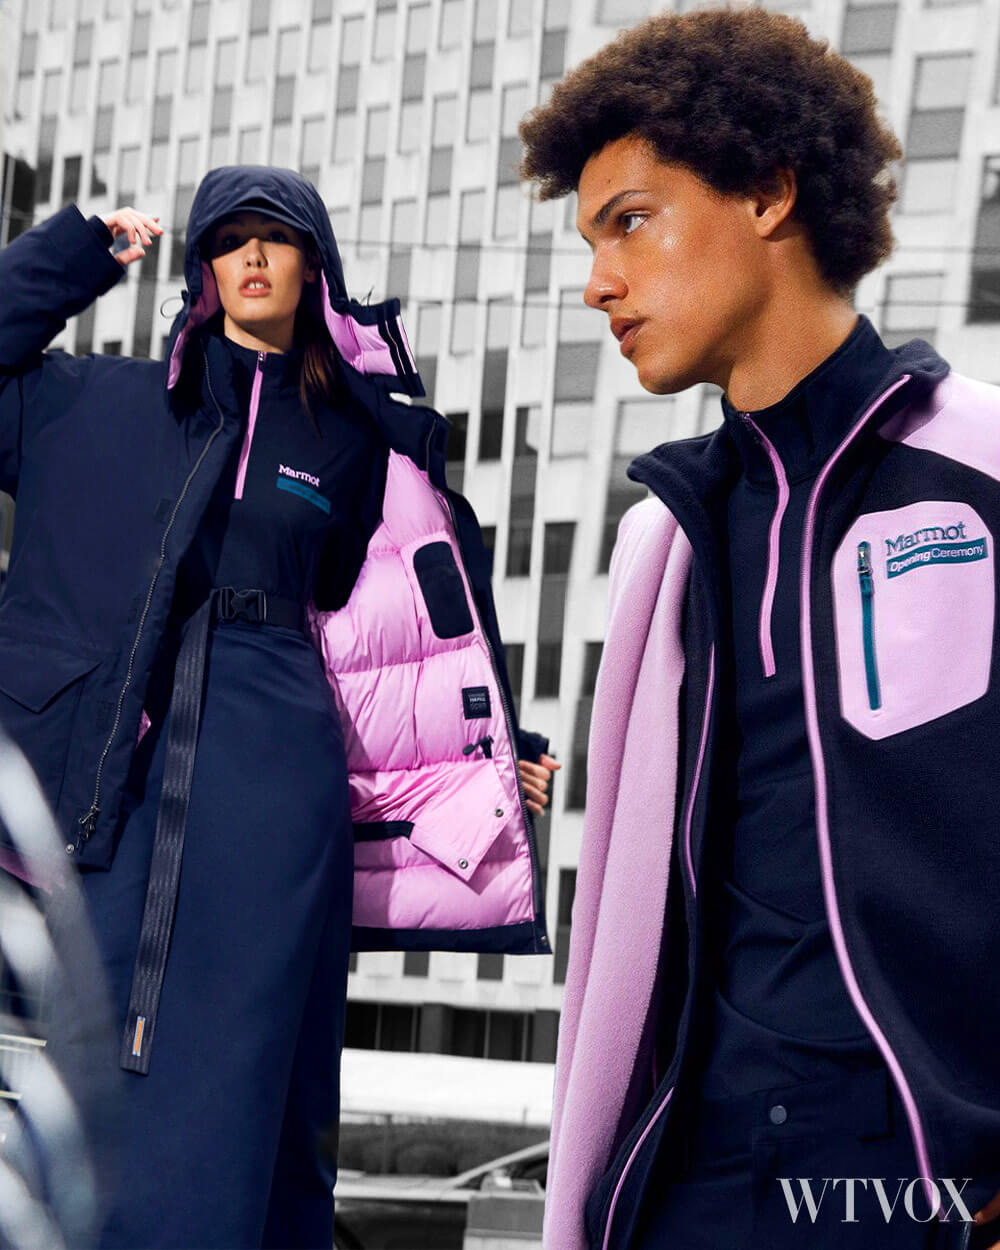 Marmot outdoor-clothing-brand